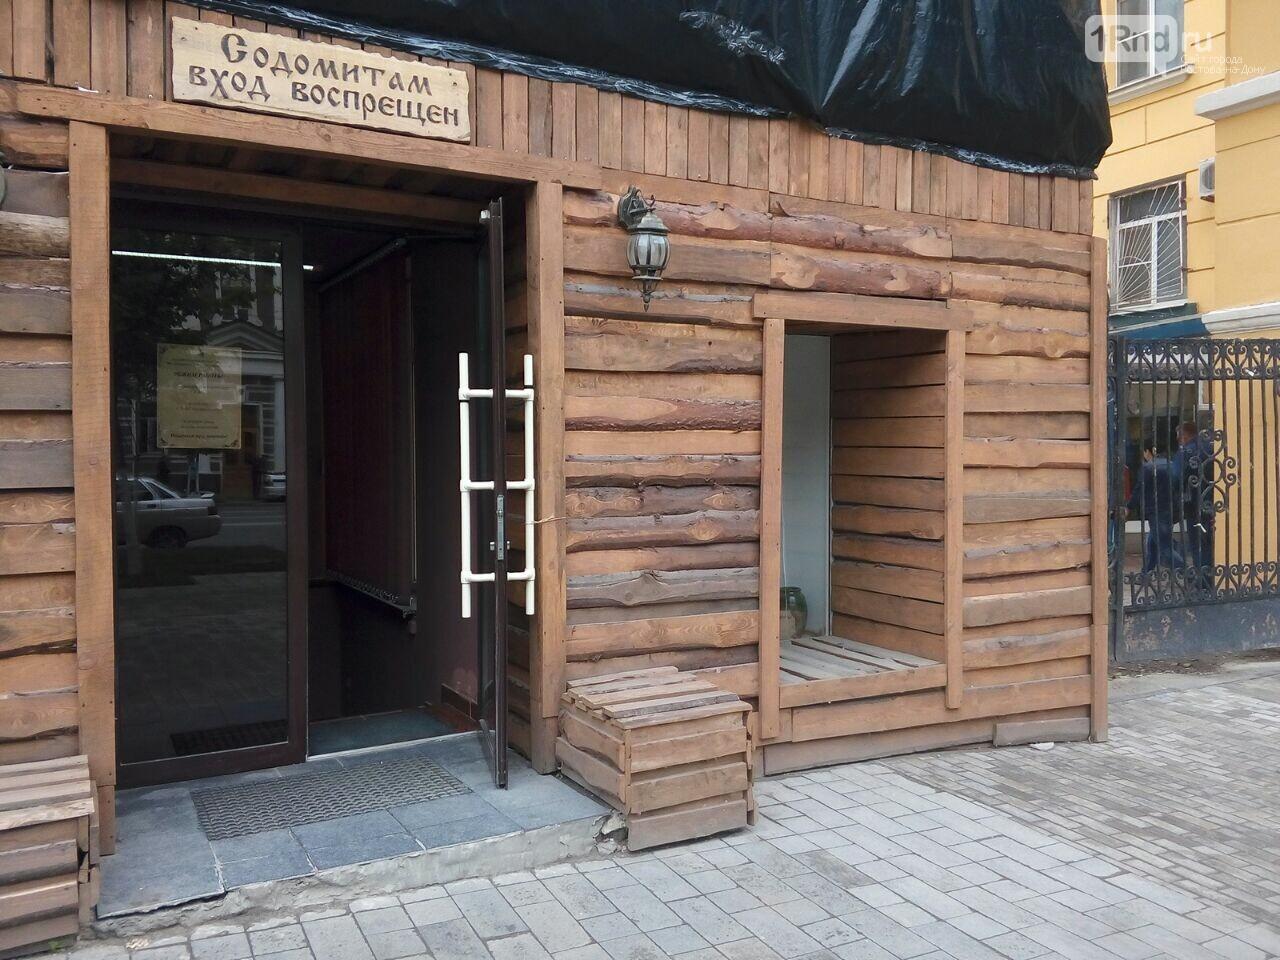 В Ростове лавку Стерлигова закрыли журналисты, фото-2, Фото: Анна Дунаева / 1rnd.ru